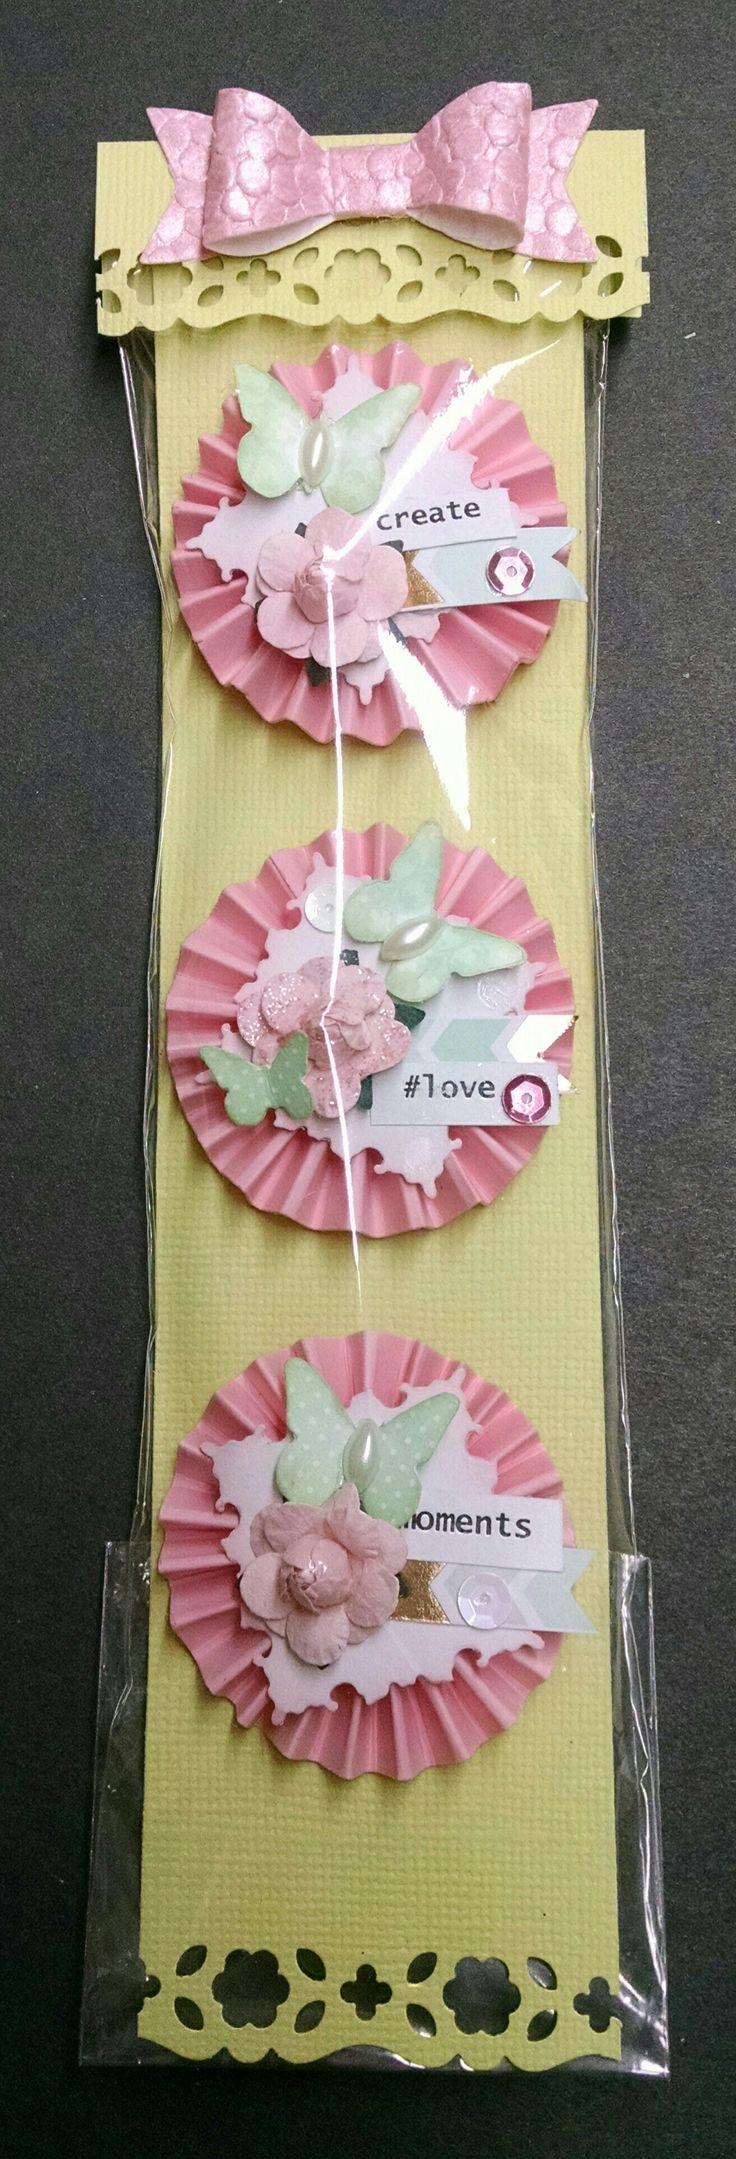 How to make scrapbook decorations - Mini Rosette Embellishments